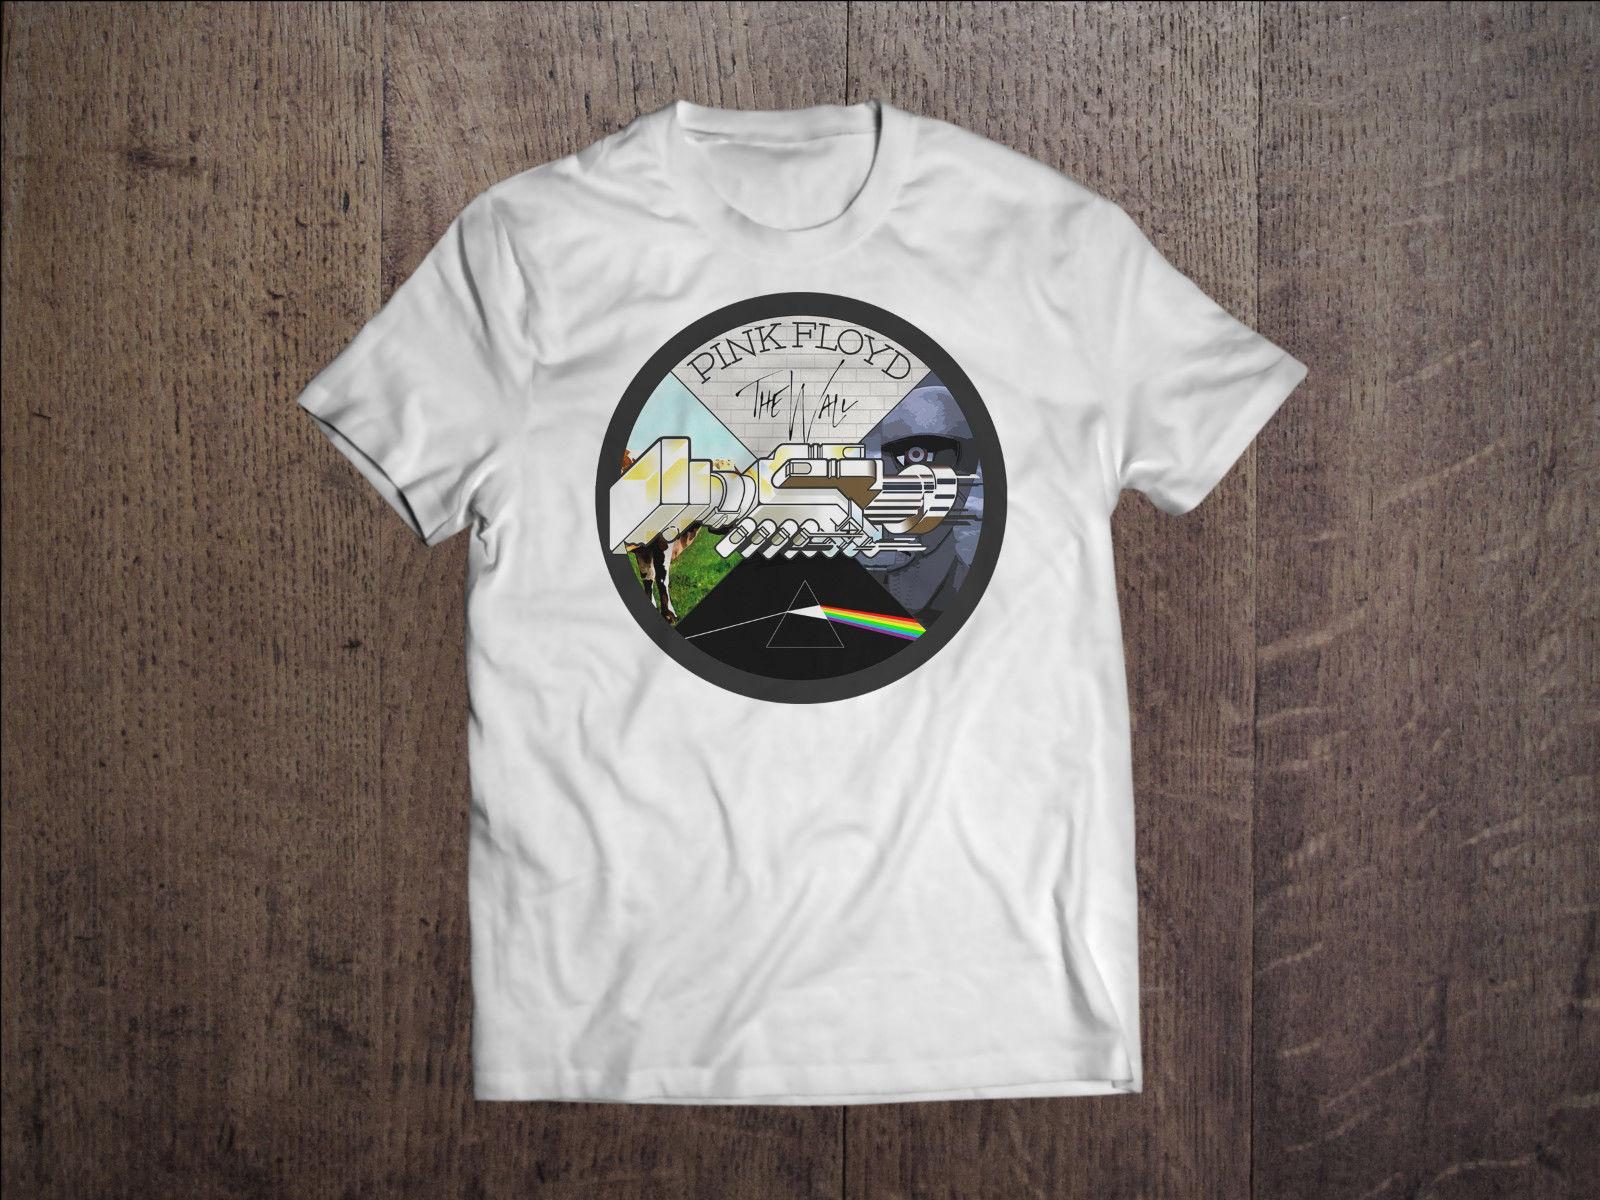 1e78fd111459 Pink Floyd Men White T Shirt Rock Band The Wall Fan Tee Shirt Sizes S M L  XL XXL Sports T Shirts Men T Shirts From Beidhgate08